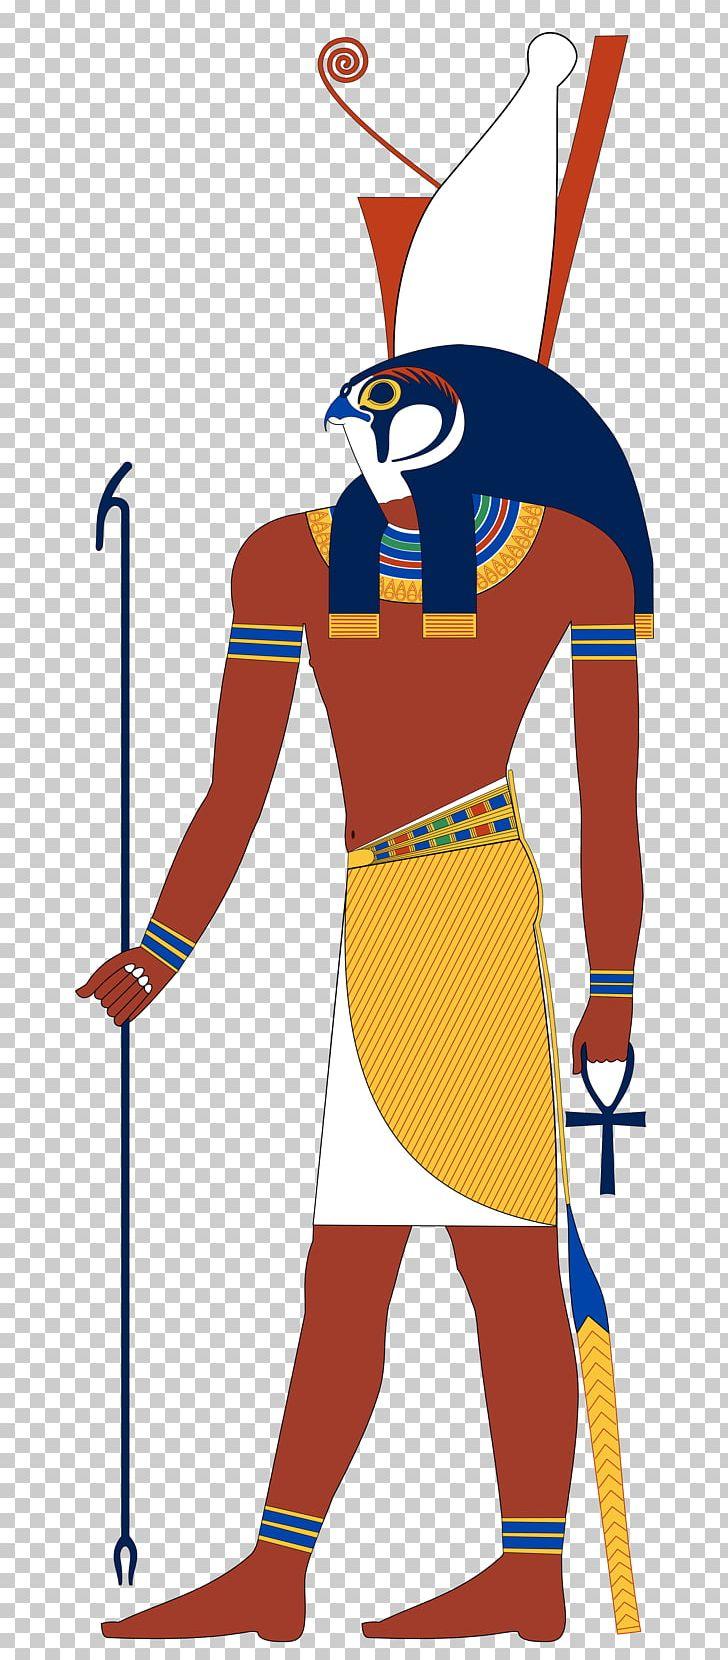 Ancient Egyptian Deities Horus Deity PNG, Clipart, Ancient.